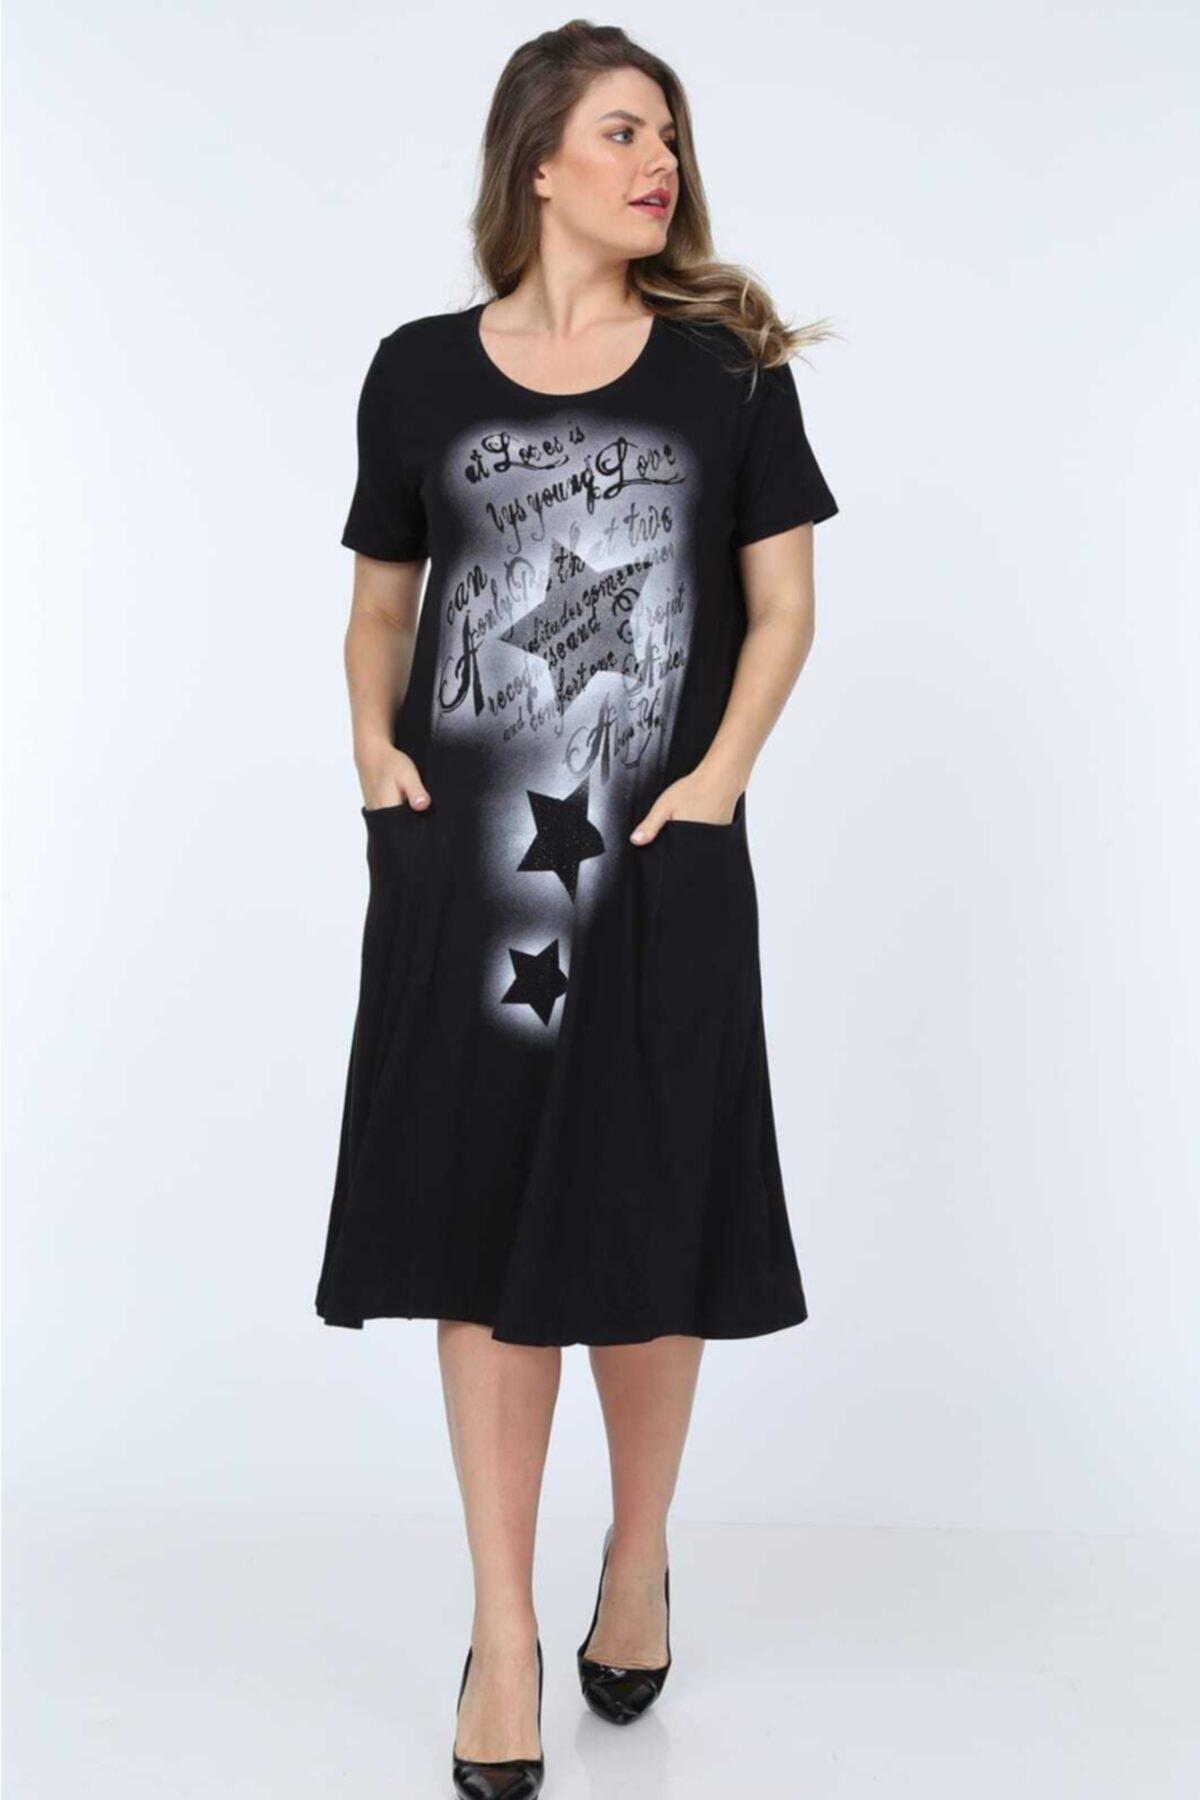 RMG Kadın Siyah Kısa Kol Cepli Elbise 1